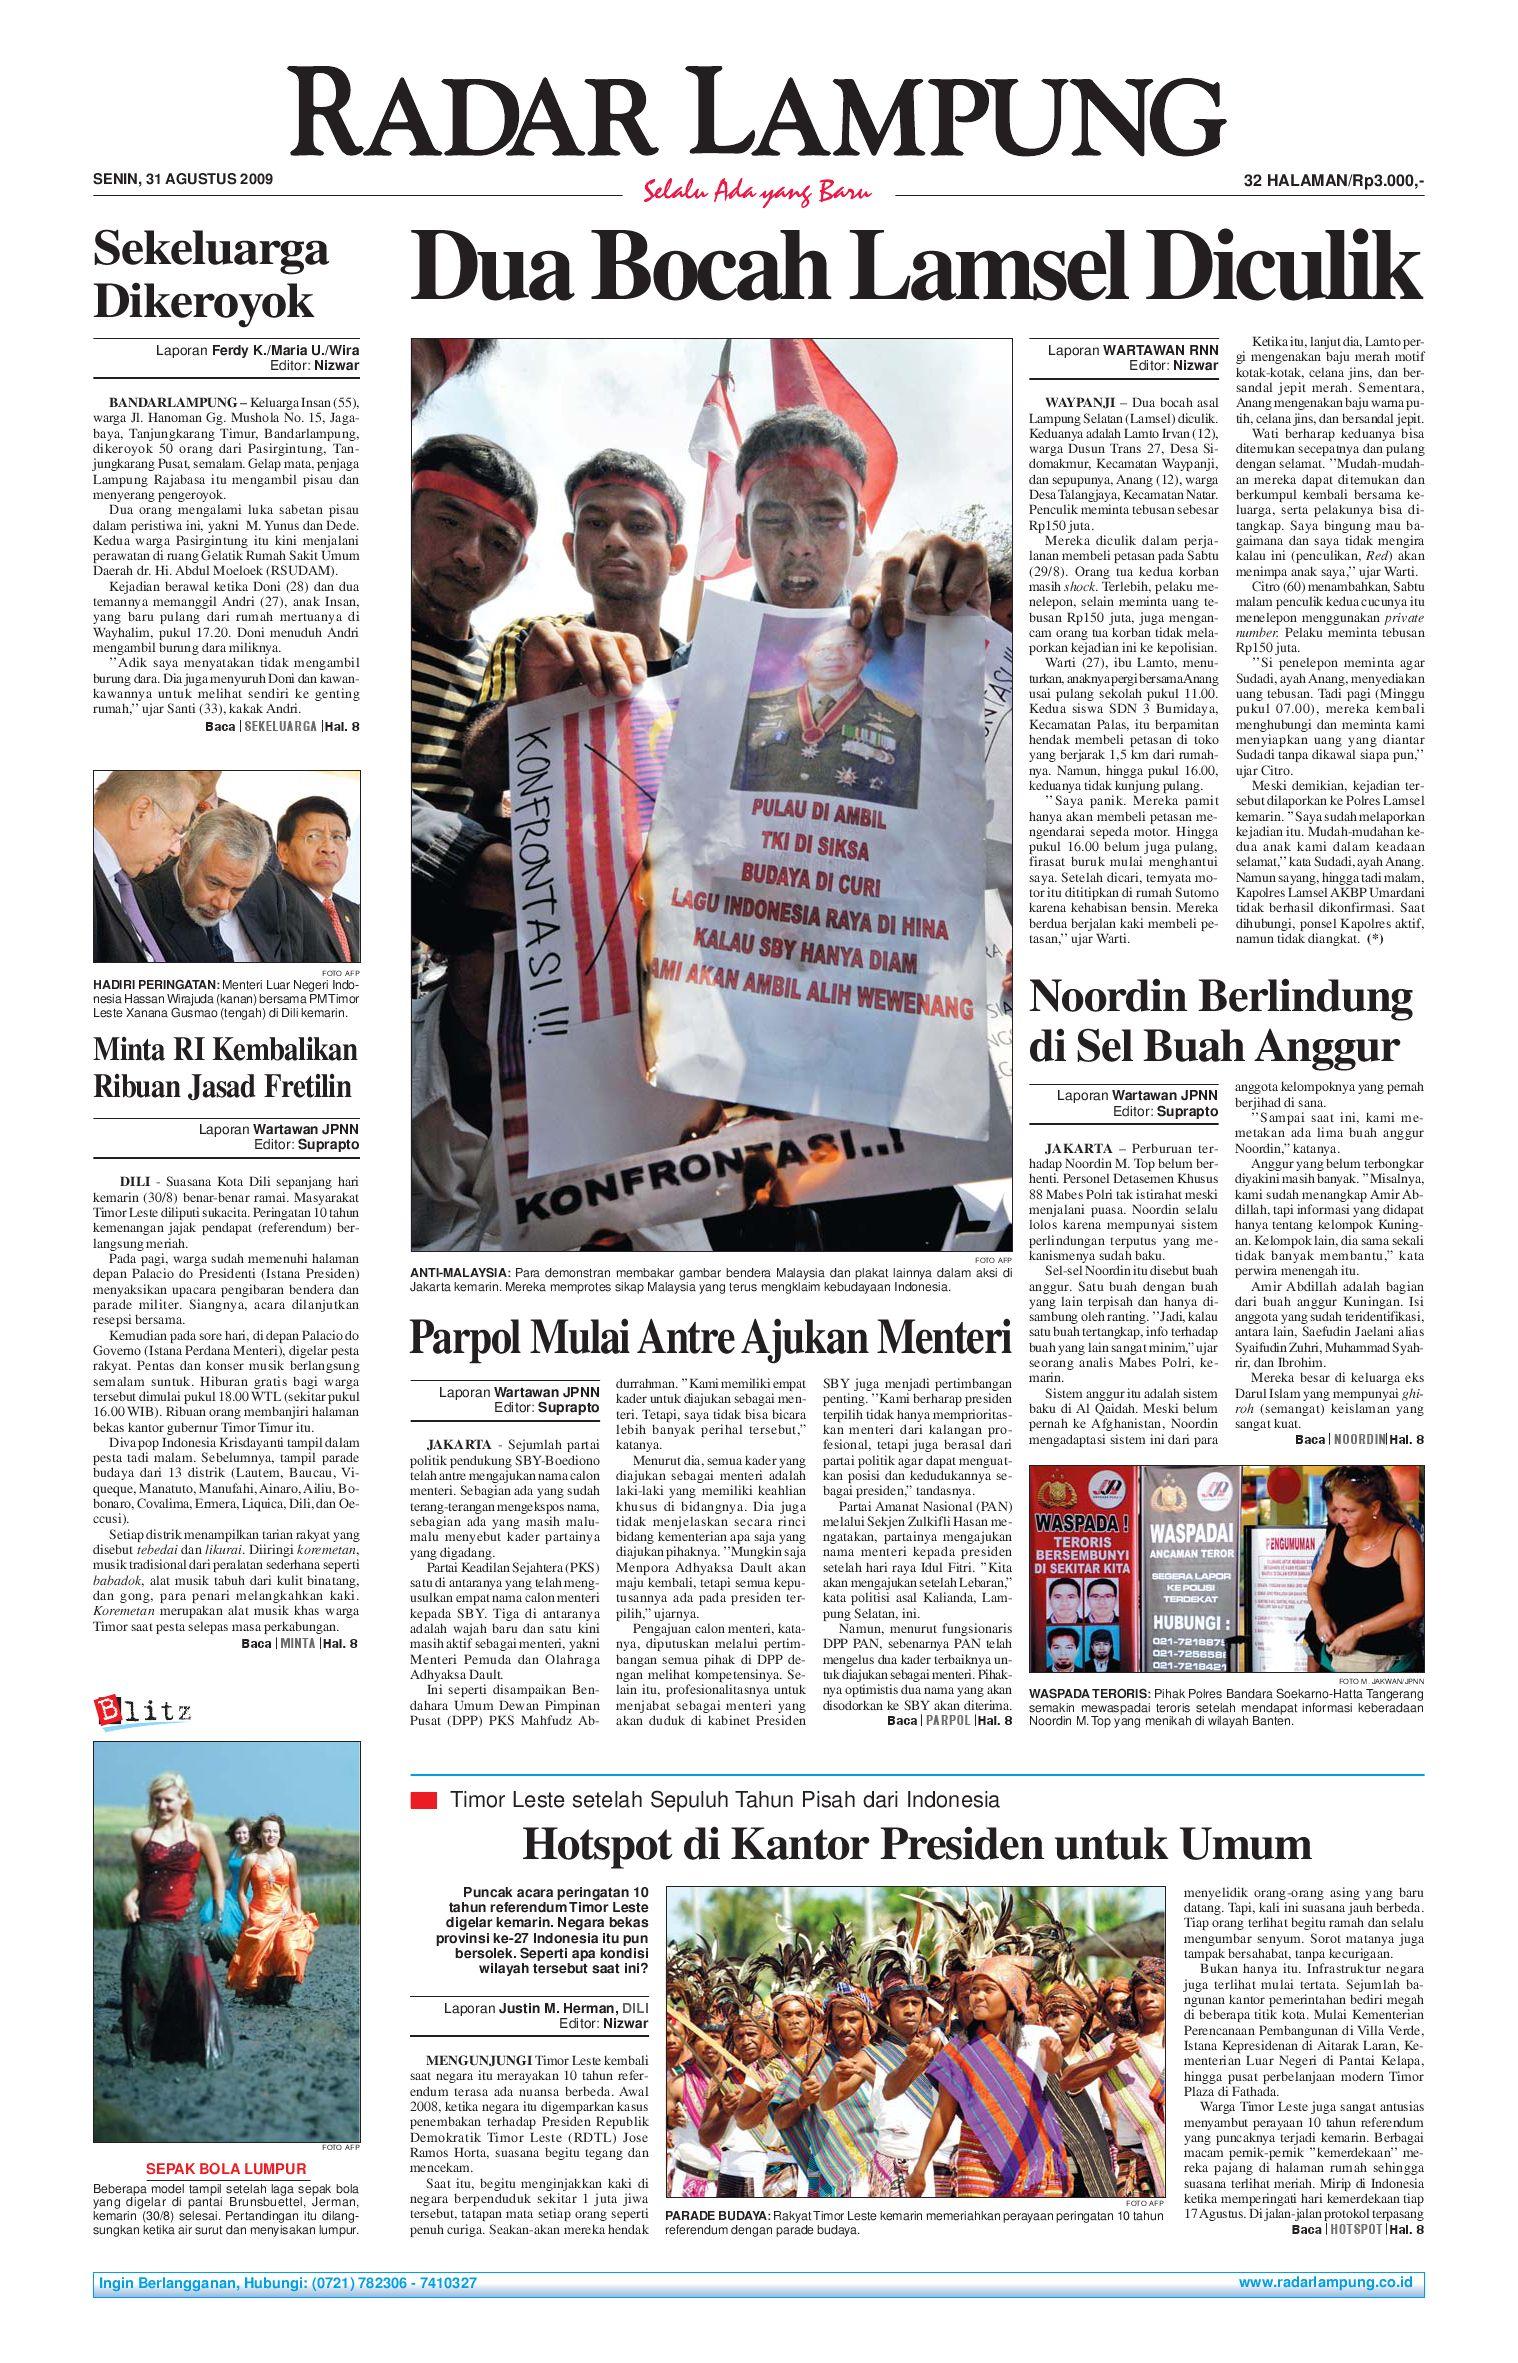 Radar Lampung Senin 31 Agustus 2009 By Issuu Produk Ukm Bumn Box Hantaran Pengantin Bio Art